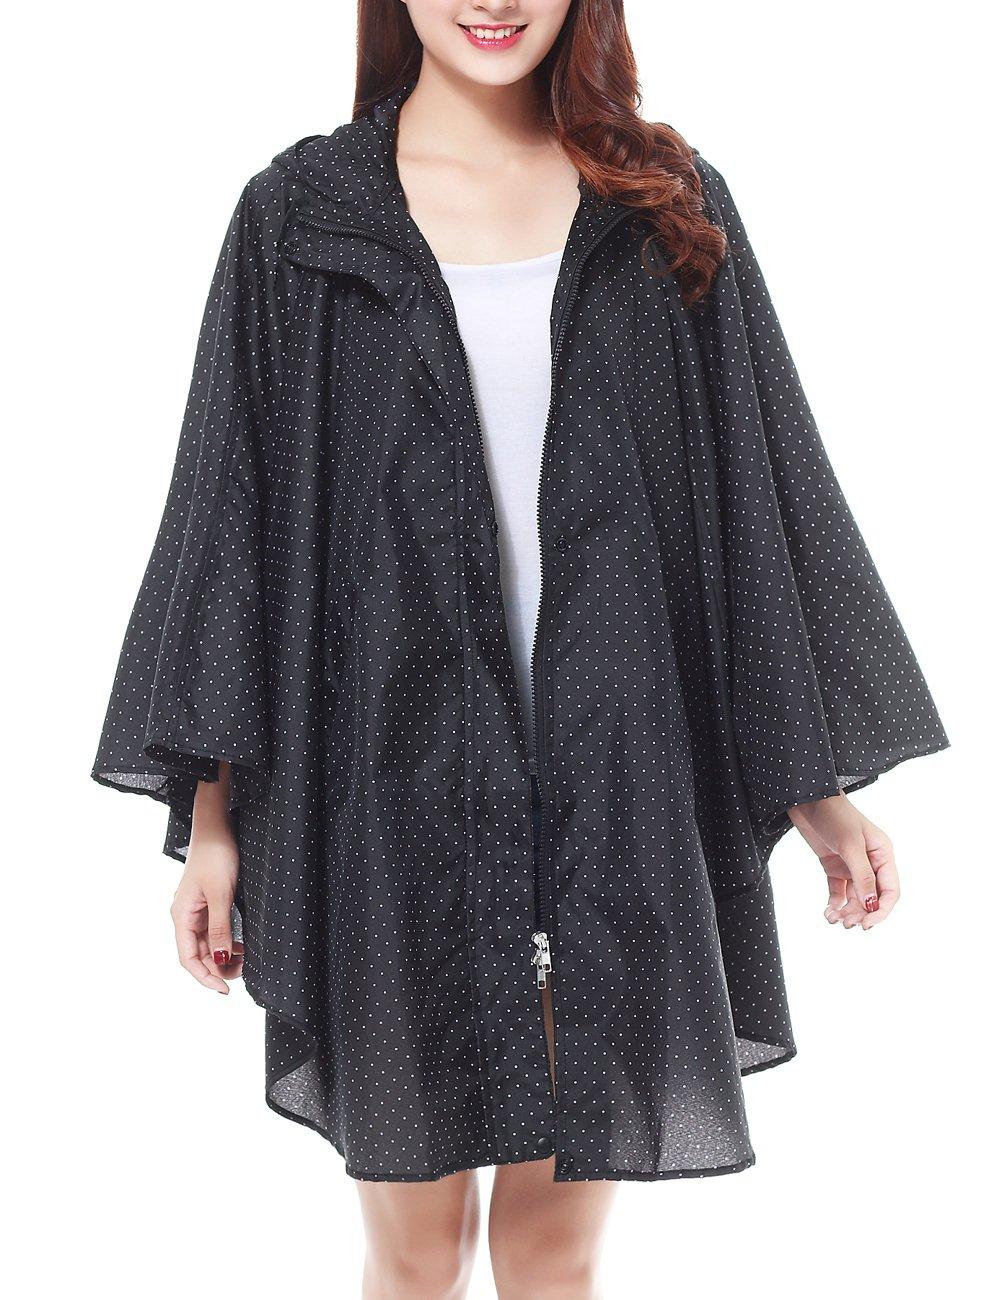 LOHASCASA Rain Coat for Adults Waterproof Packable Rain Poncho Polka Dot Black